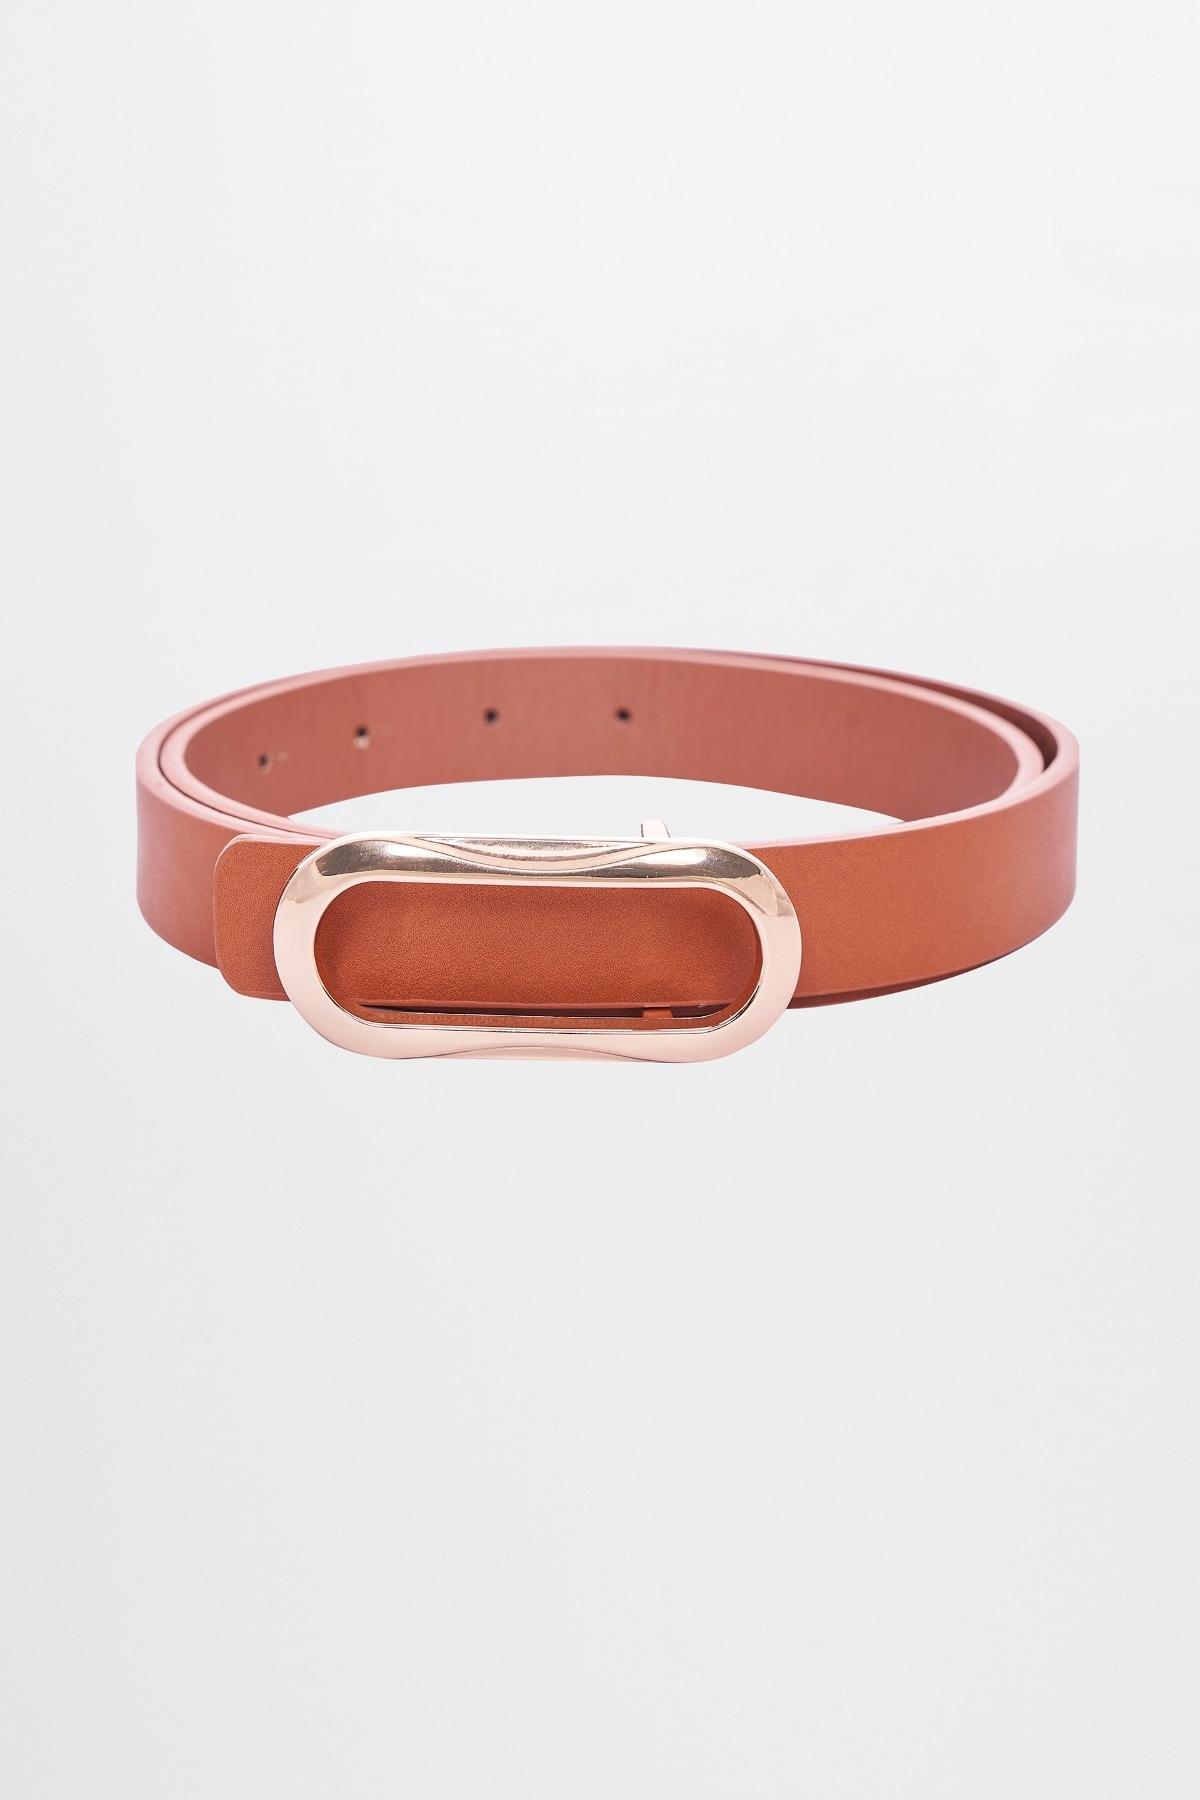 AND | Tan Belt